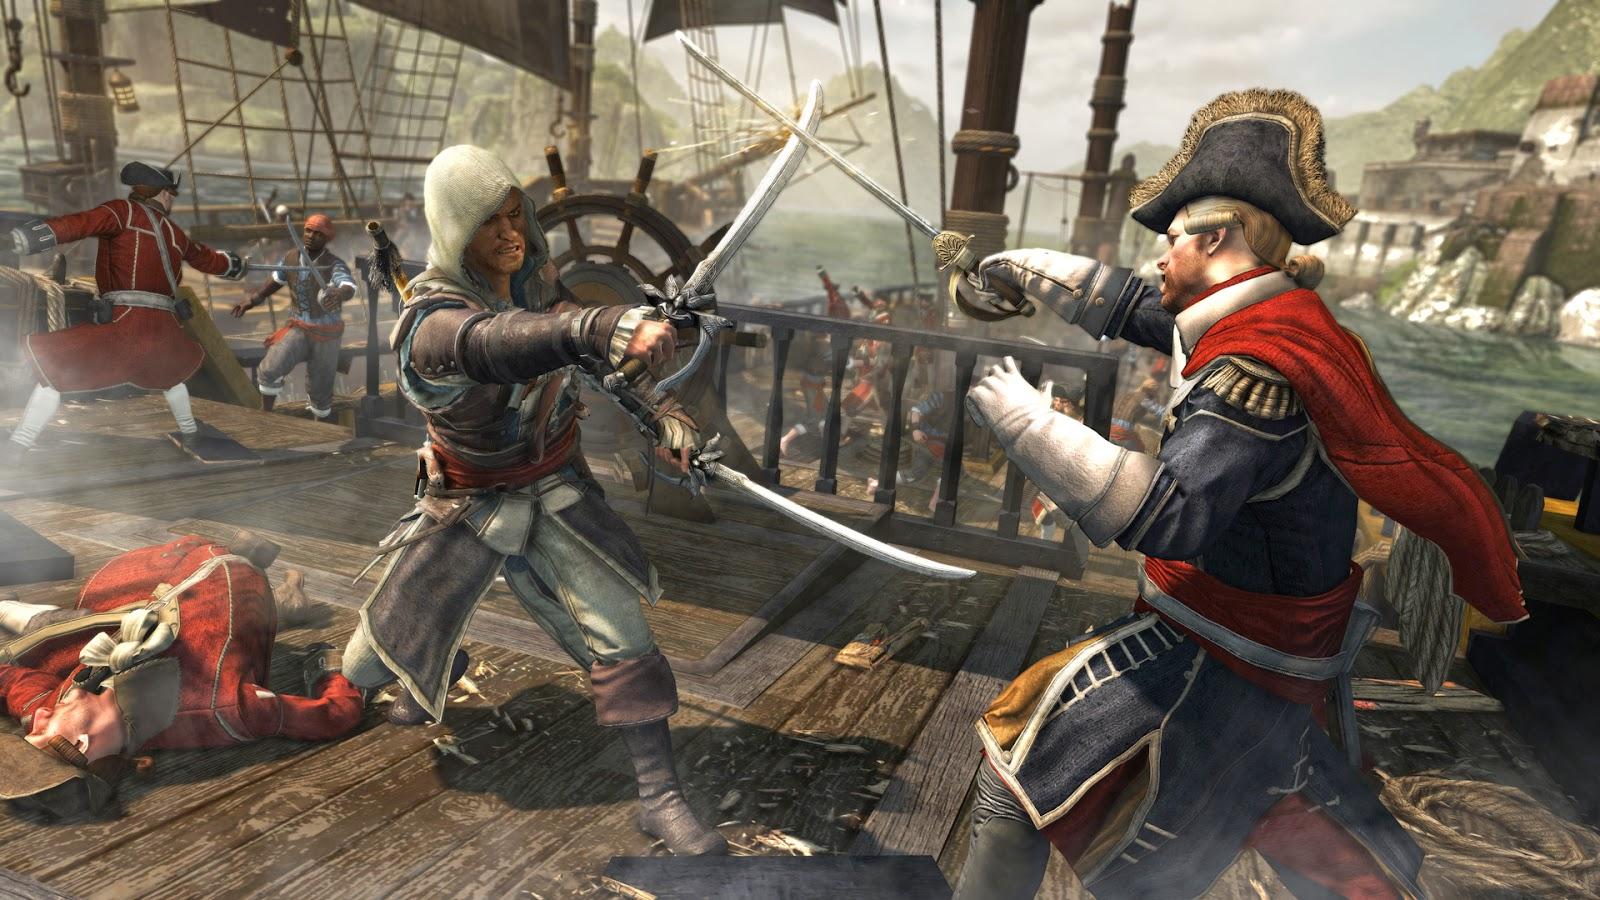 Assassins Creed IV Black Flag PS3 free download full version